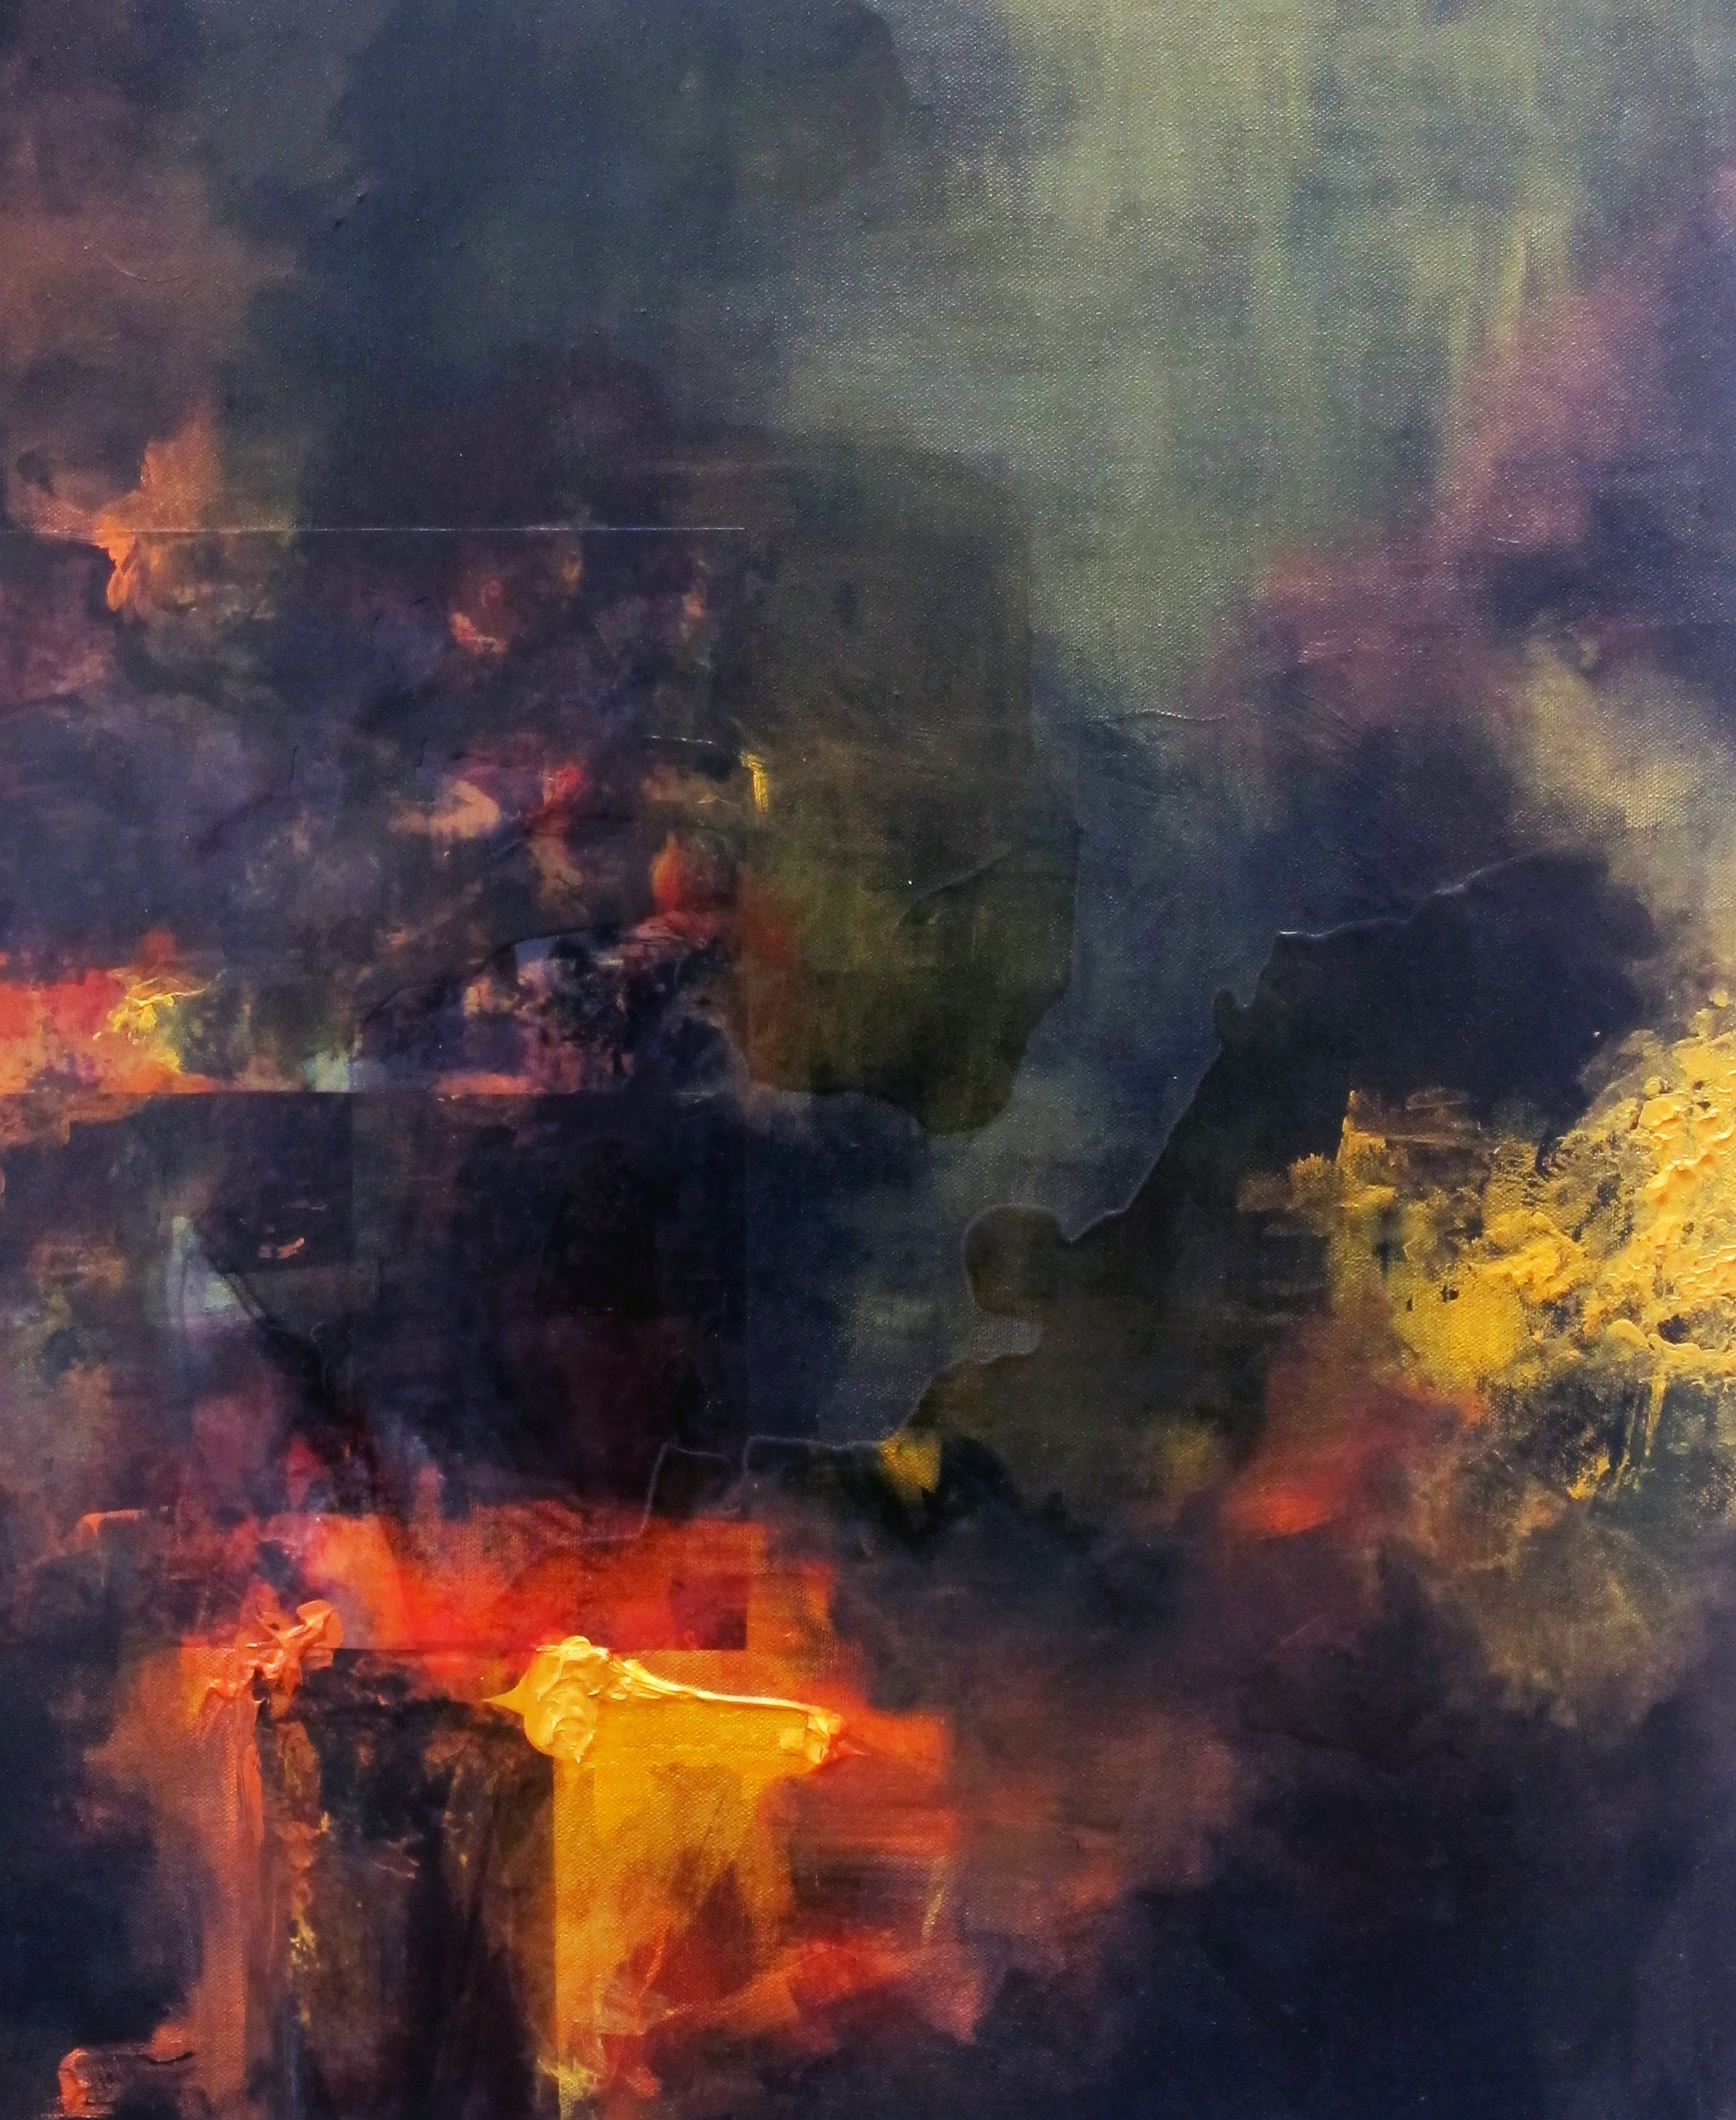 Colour Study 1, 2014 (SOLD)